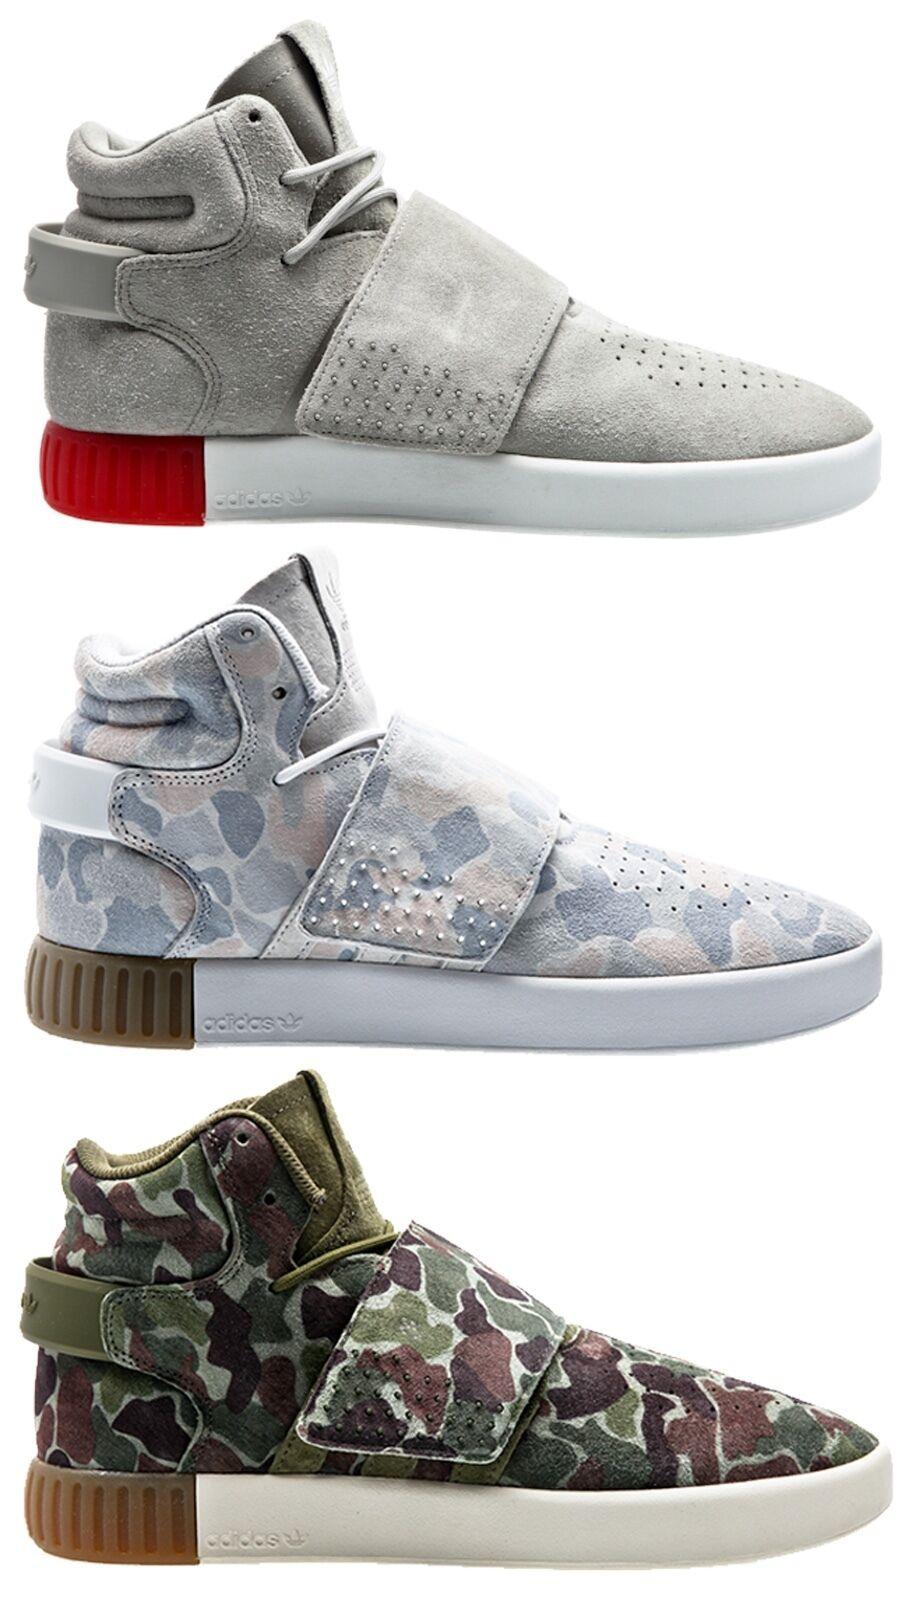 adidas Tubular Invader Strap Running Men Sneaker Herren Schuh shoes